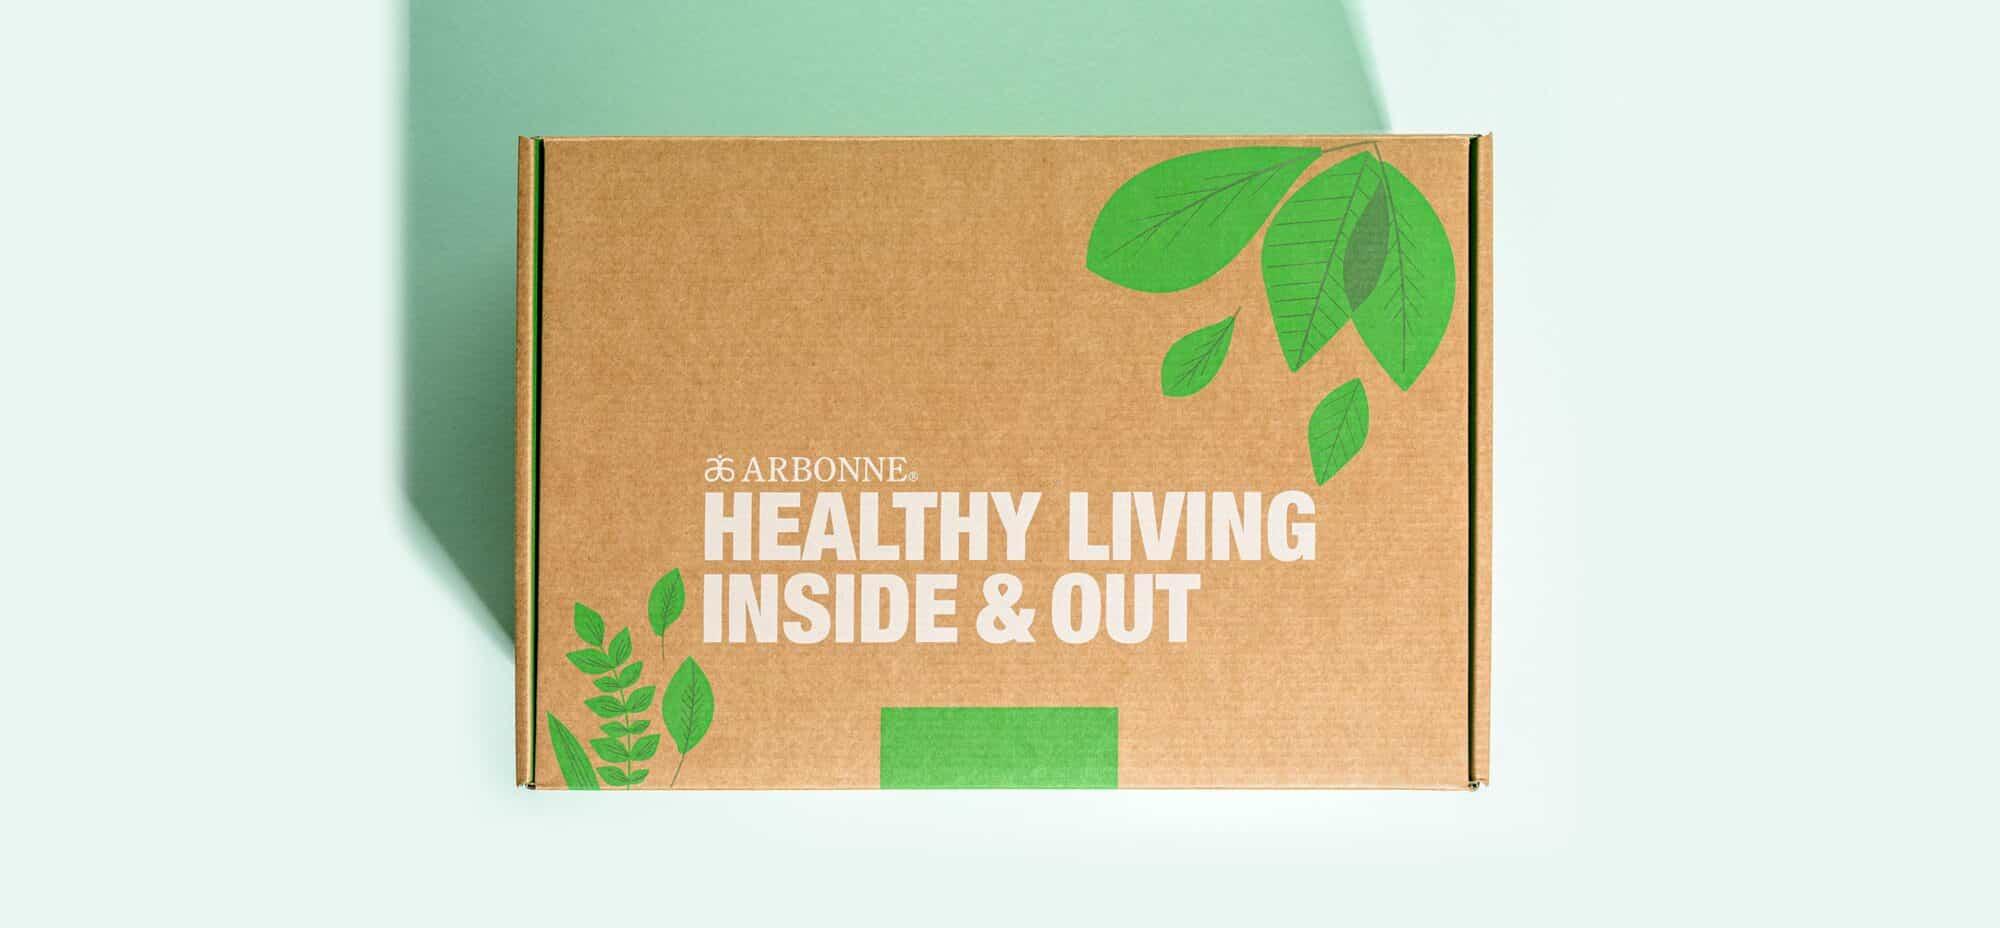 eco-friendly printed postal boxes